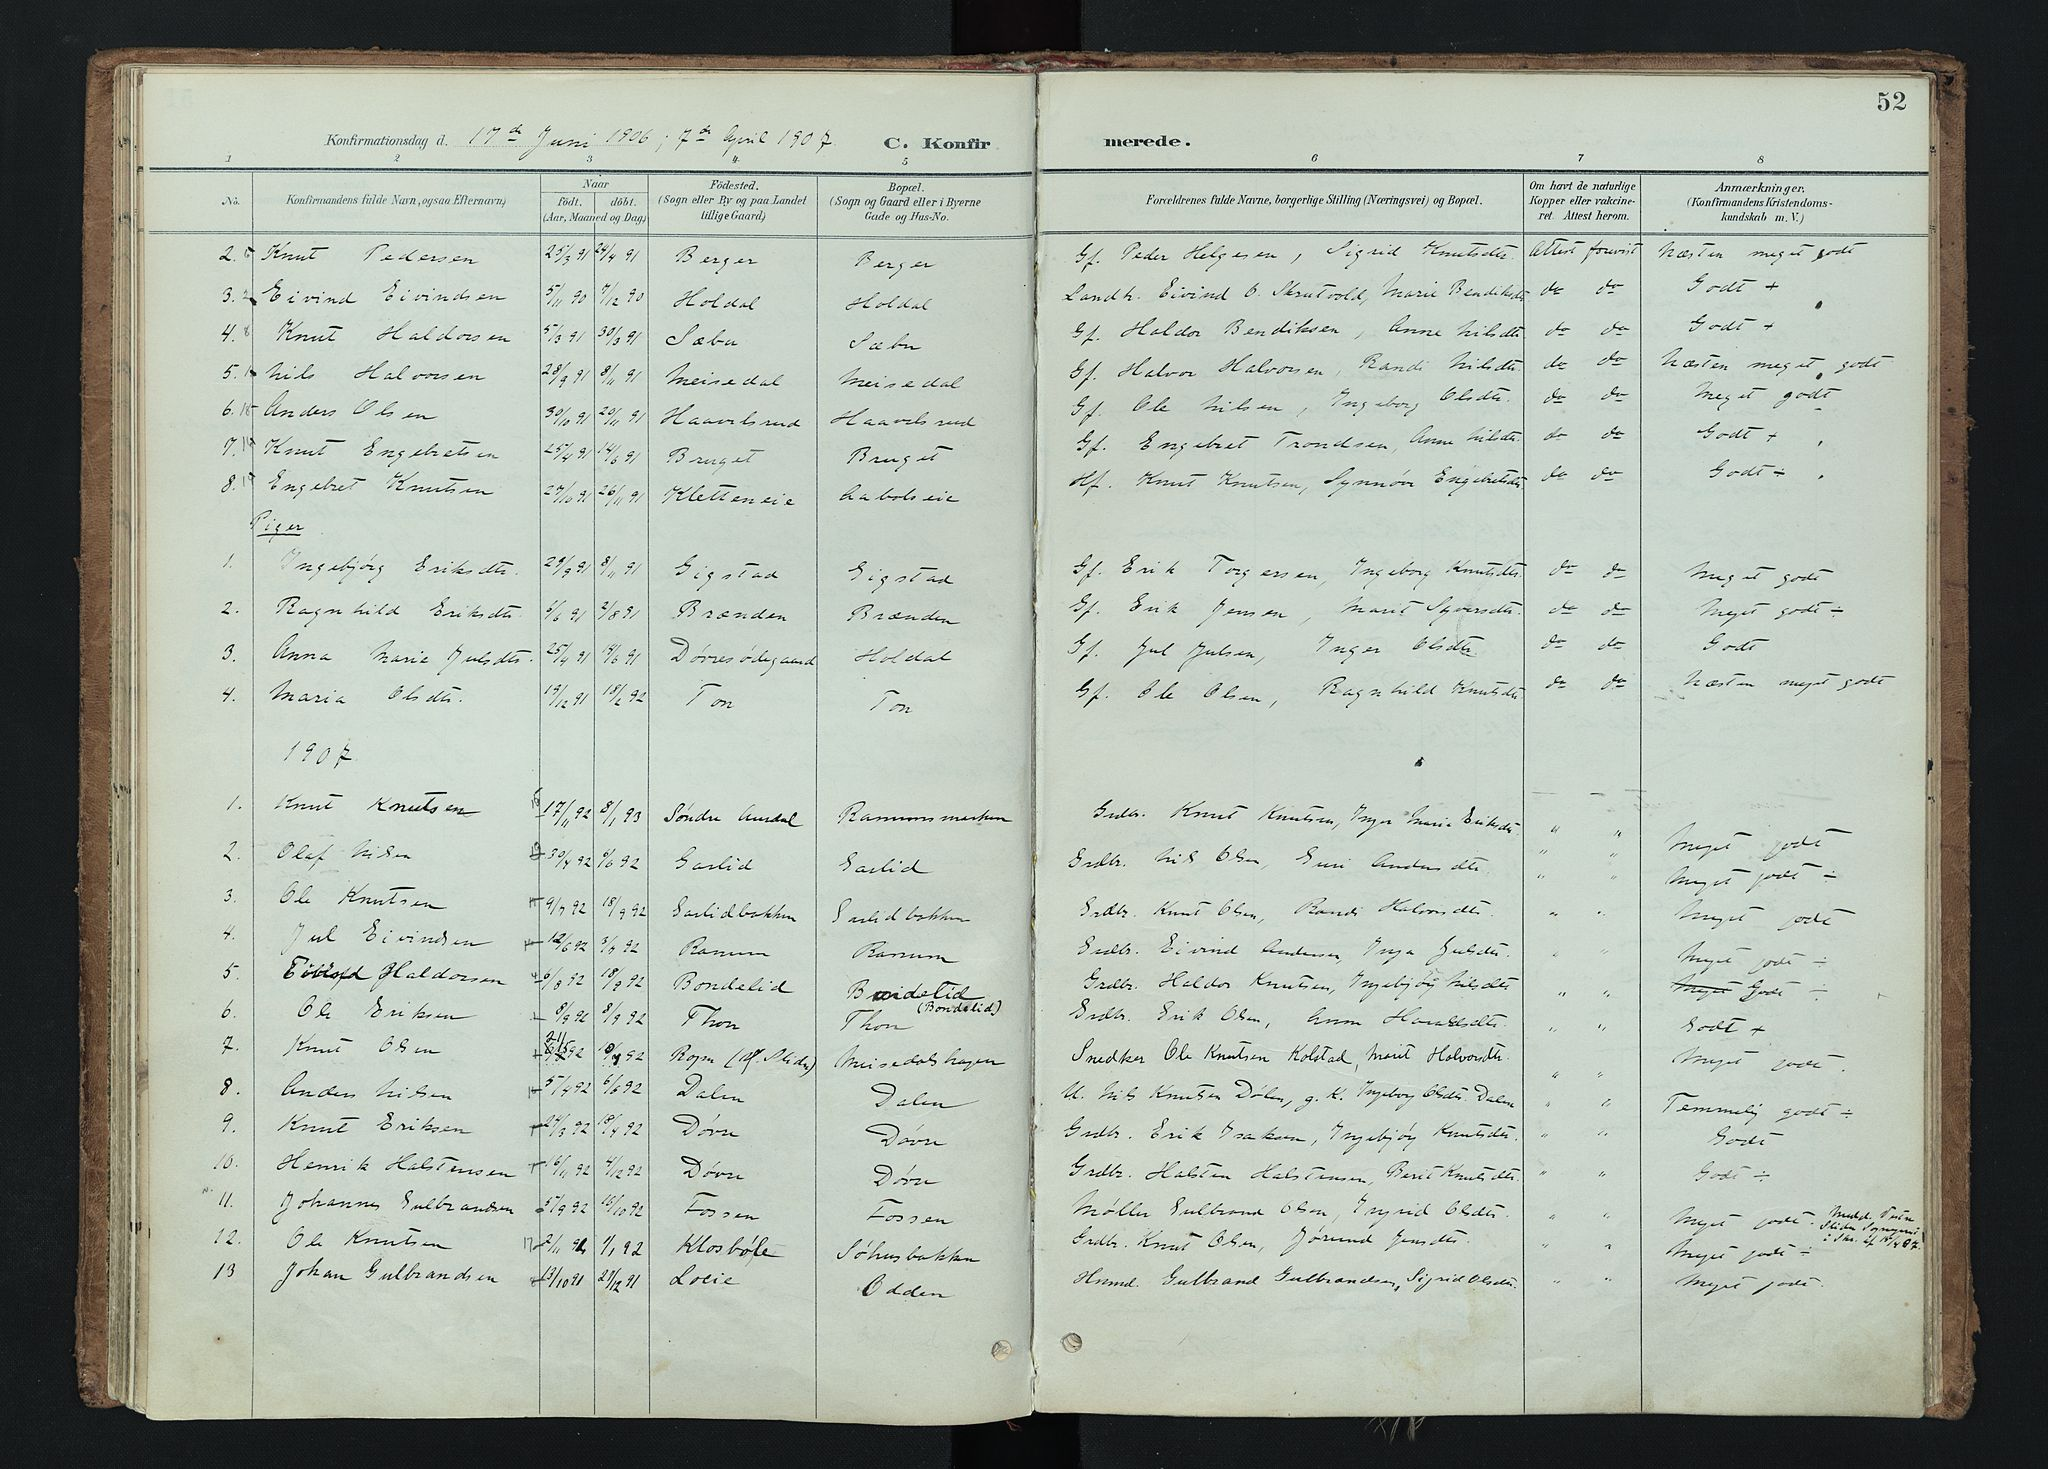 SAH, Nord-Aurdal prestekontor, Ministerialbok nr. 15, 1896-1914, s. 52